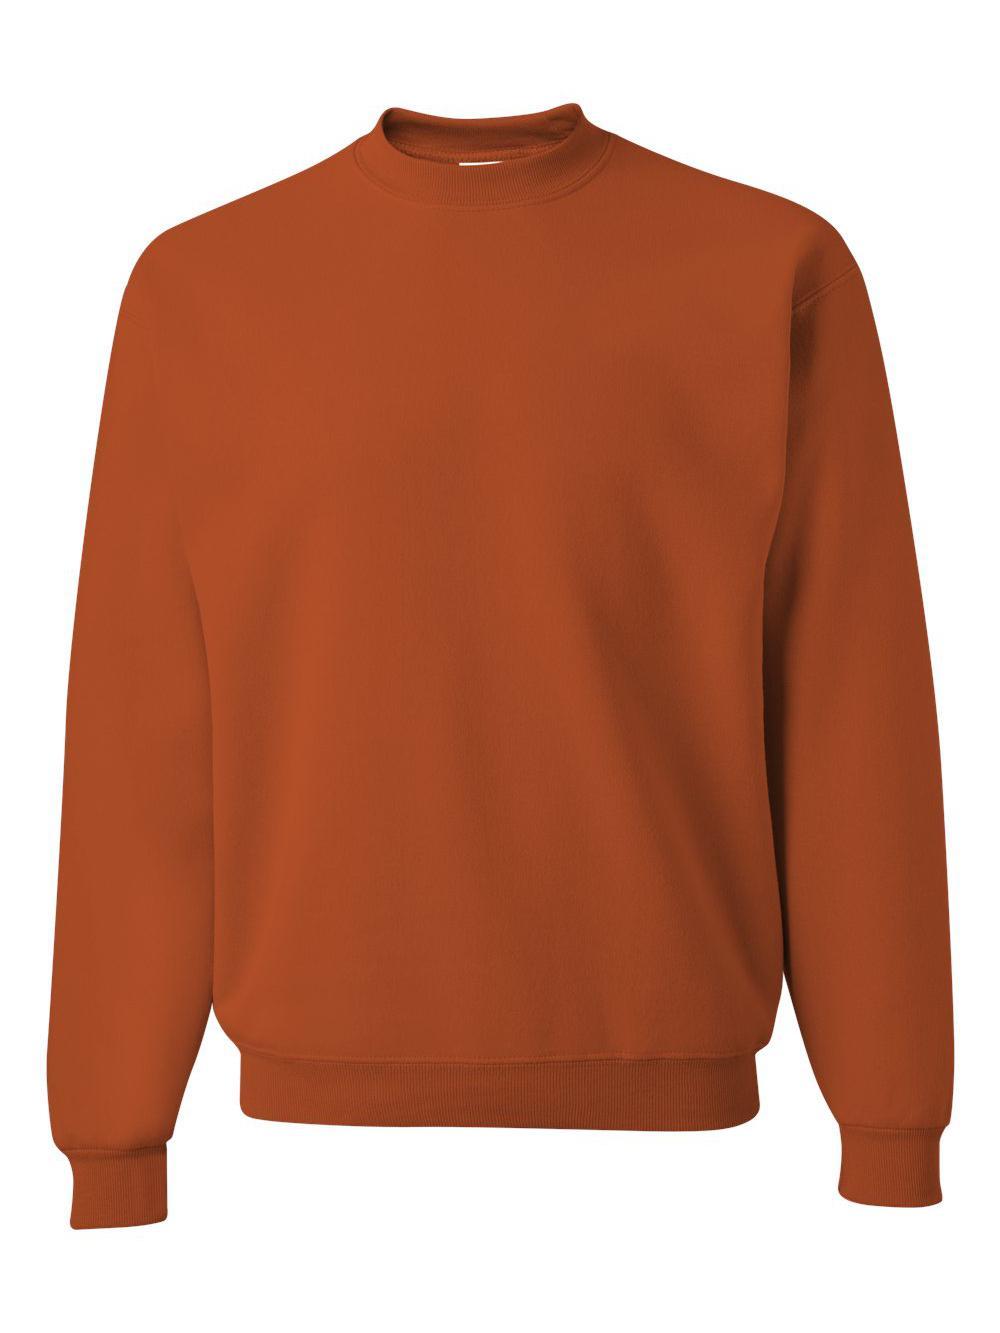 Jerzees-NuBlend-Crewneck-Sweatshirt-562MR thumbnail 87